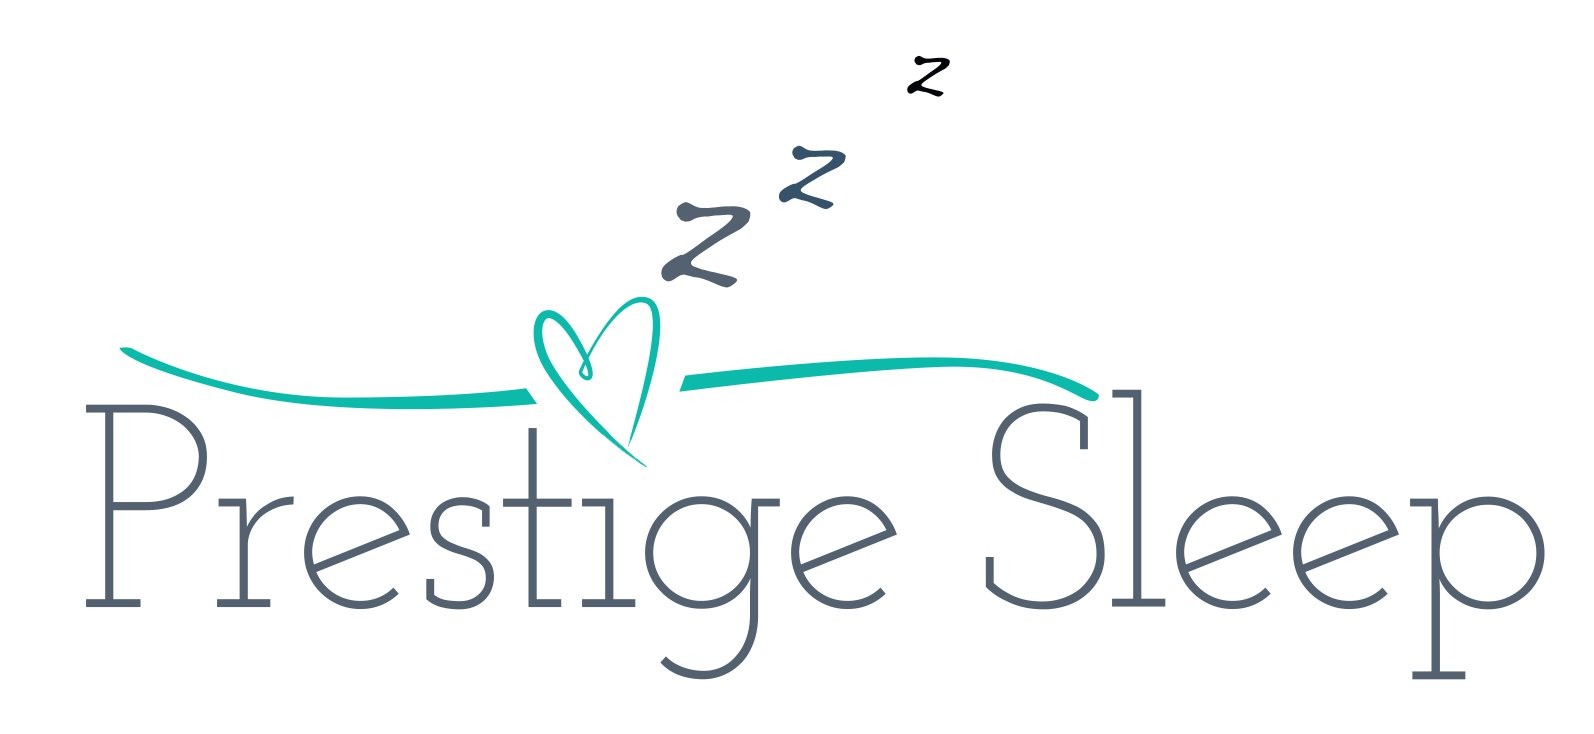 https://www.story22.co.uk/wp-content/uploads/2021/03/Prestige-logo.jpg